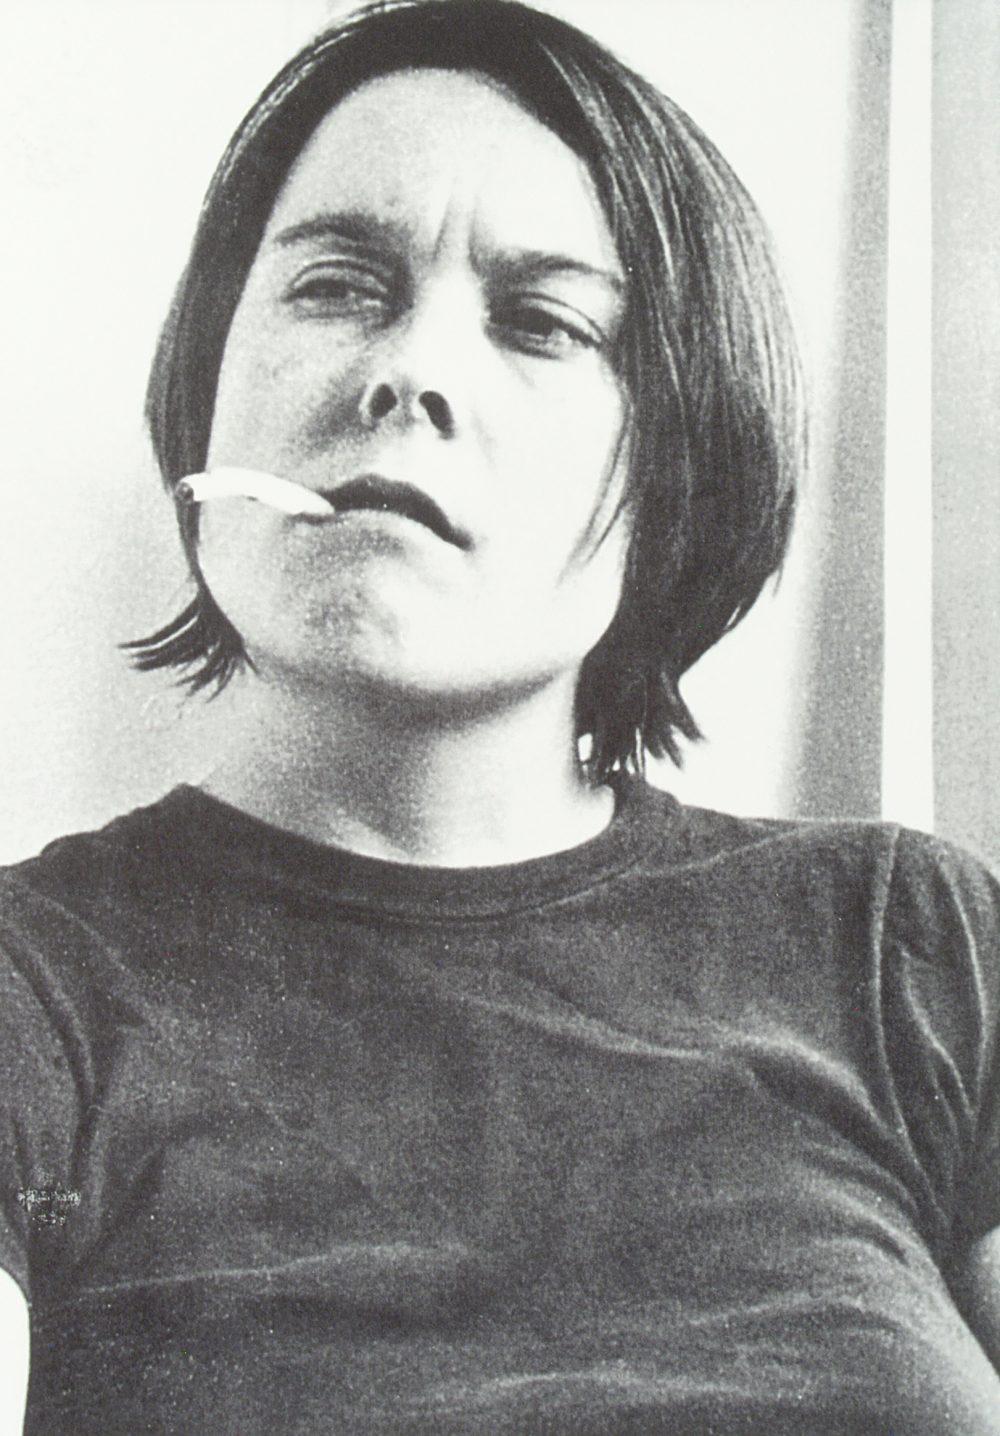 artist Sarah Lucas smoking a cigarette with long ash